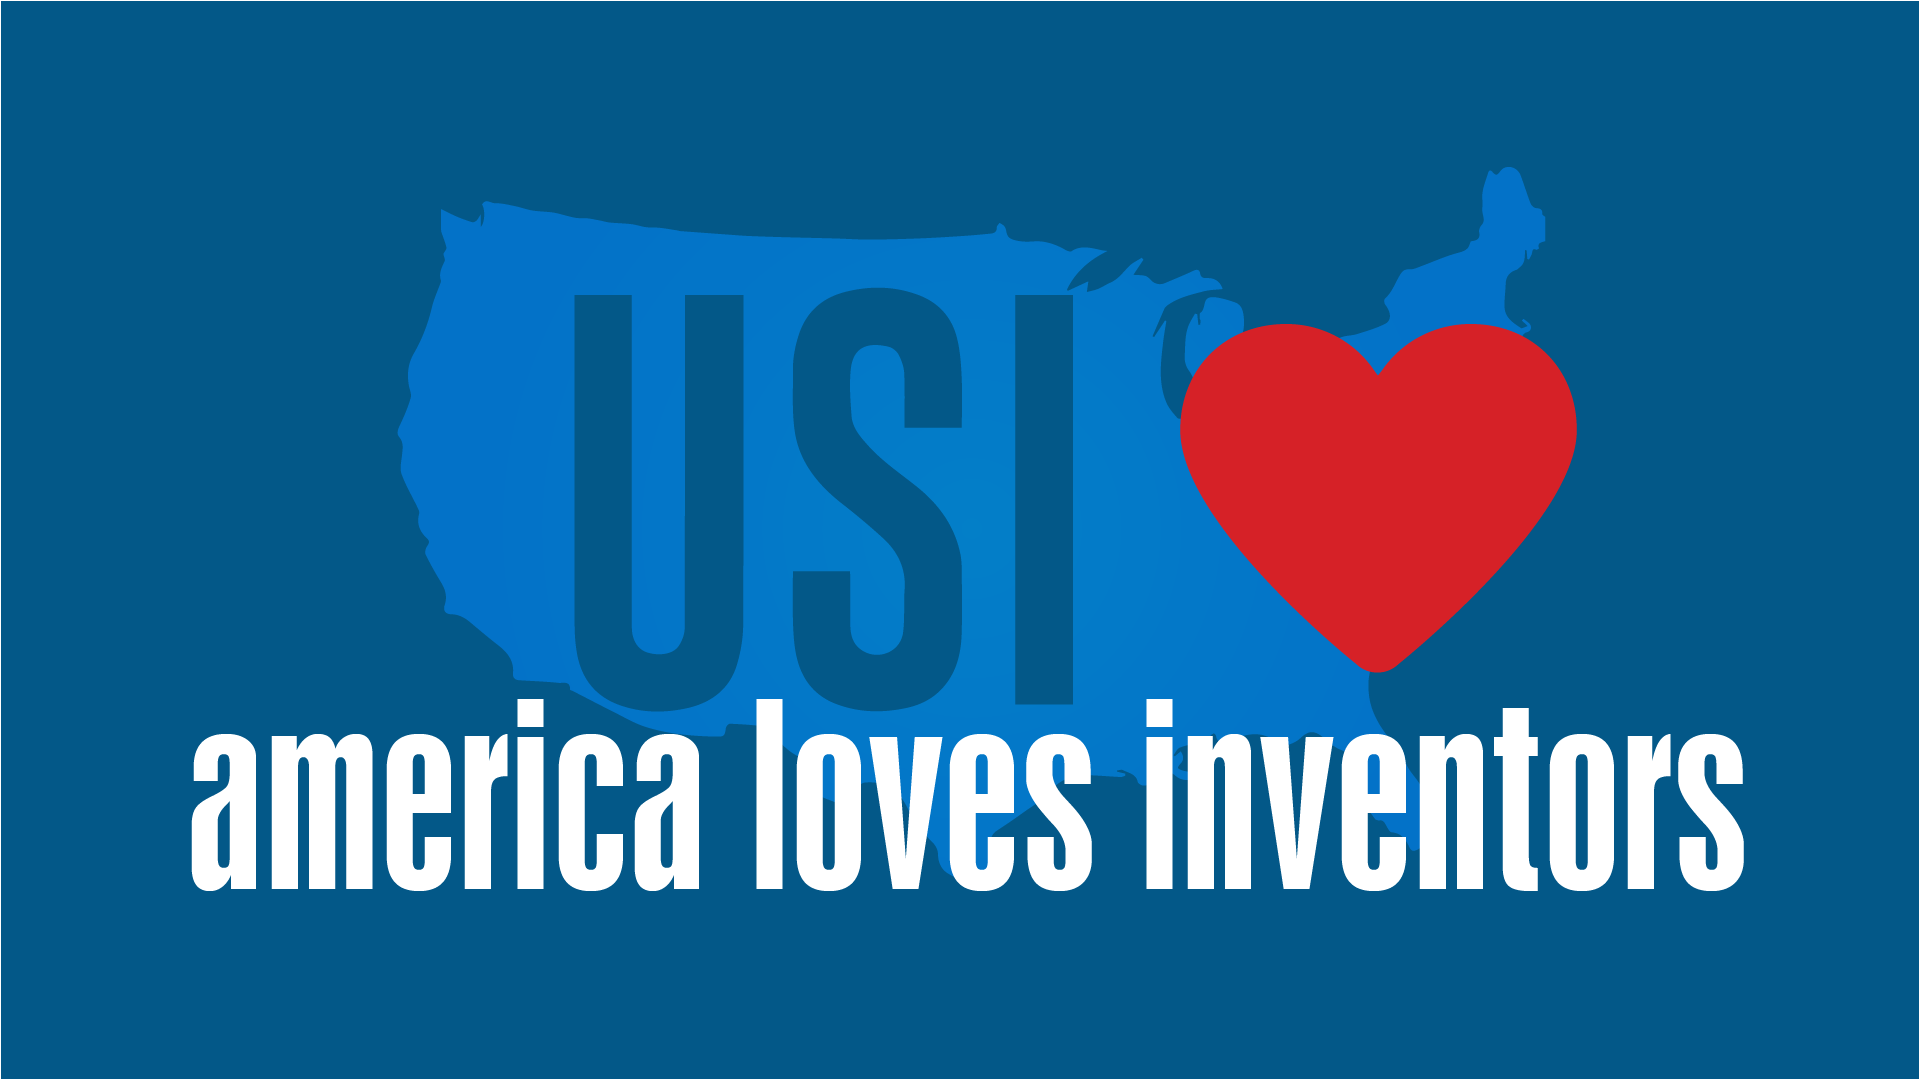 America Loves Inventors - US Inventor